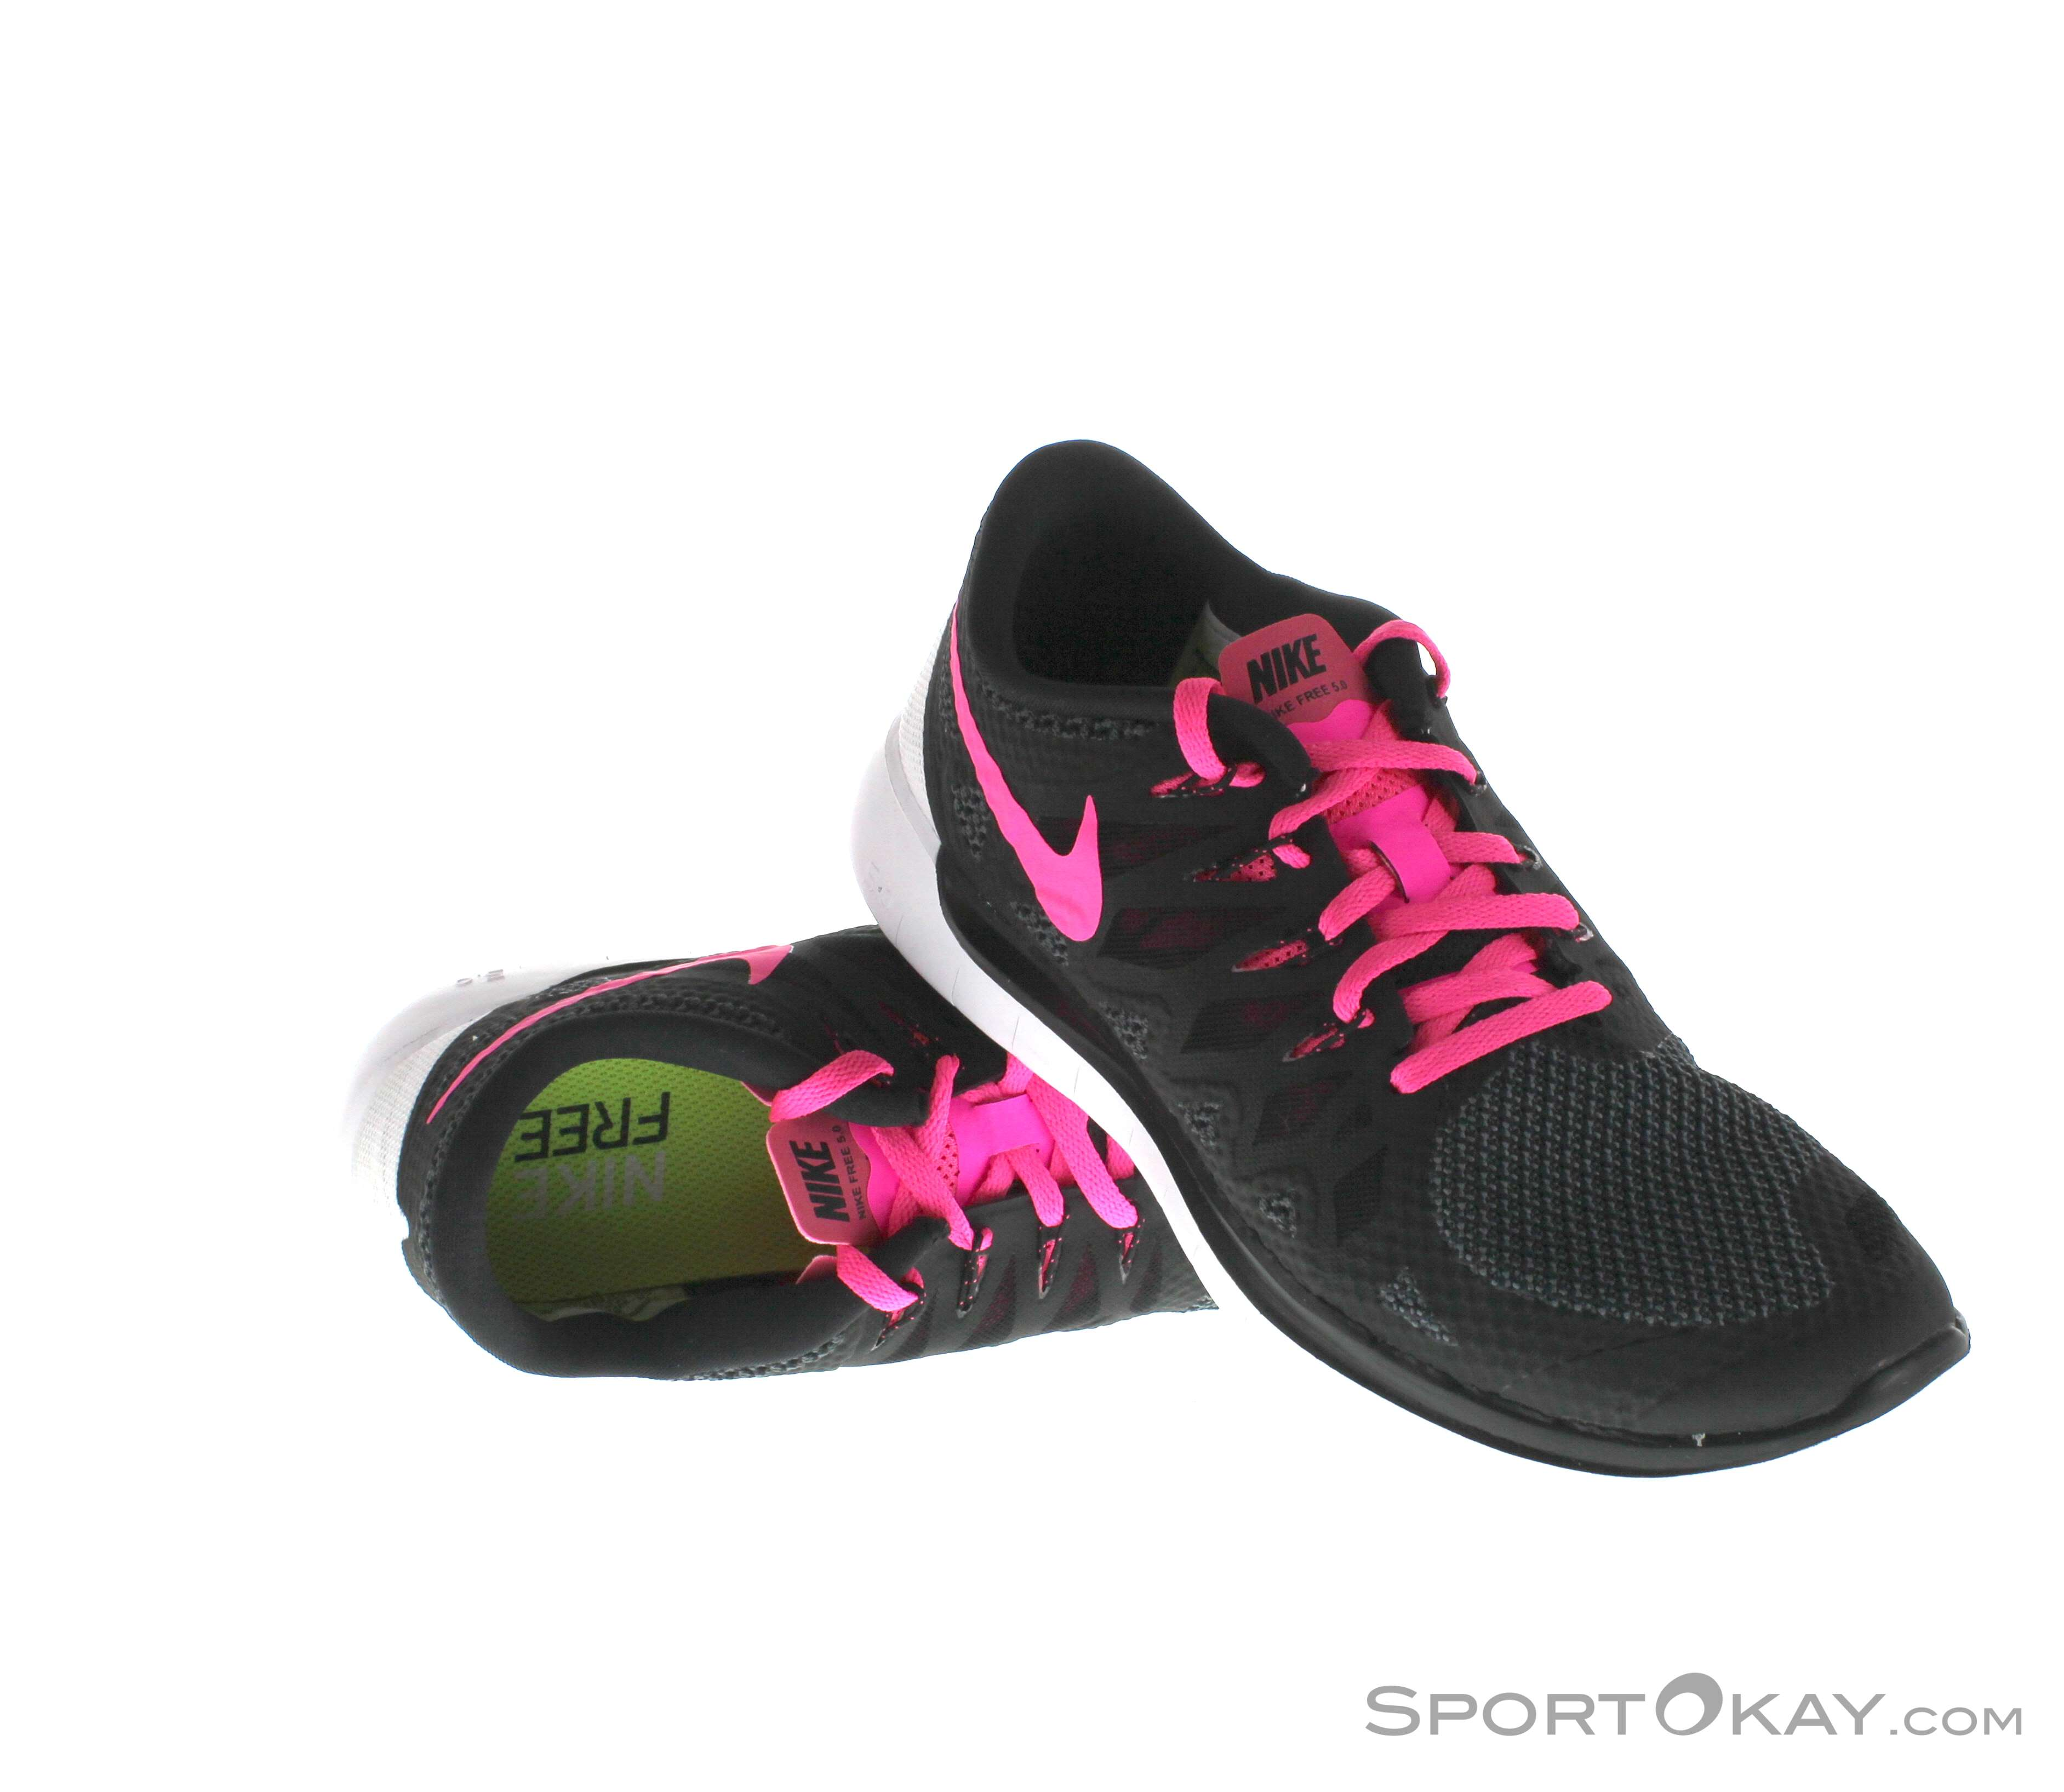 Nike Free 5.0 Laufschuhe Sportschuhe Damen Größe 40 schwarz